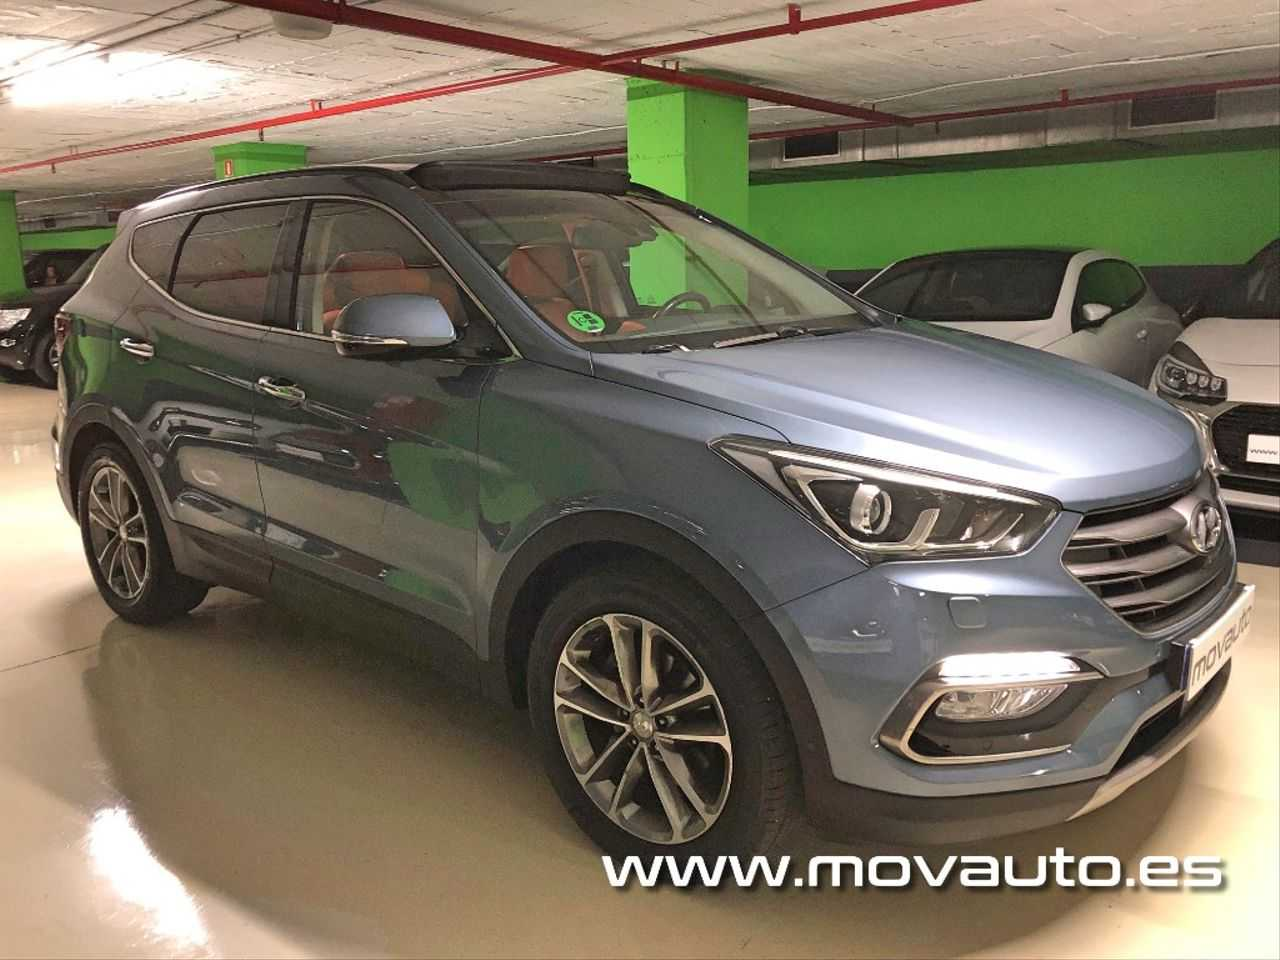 Hyundai Santa Fe 2.2 CRDi Style Safe Brown Ed Auto 4x4 7S   - Foto 1